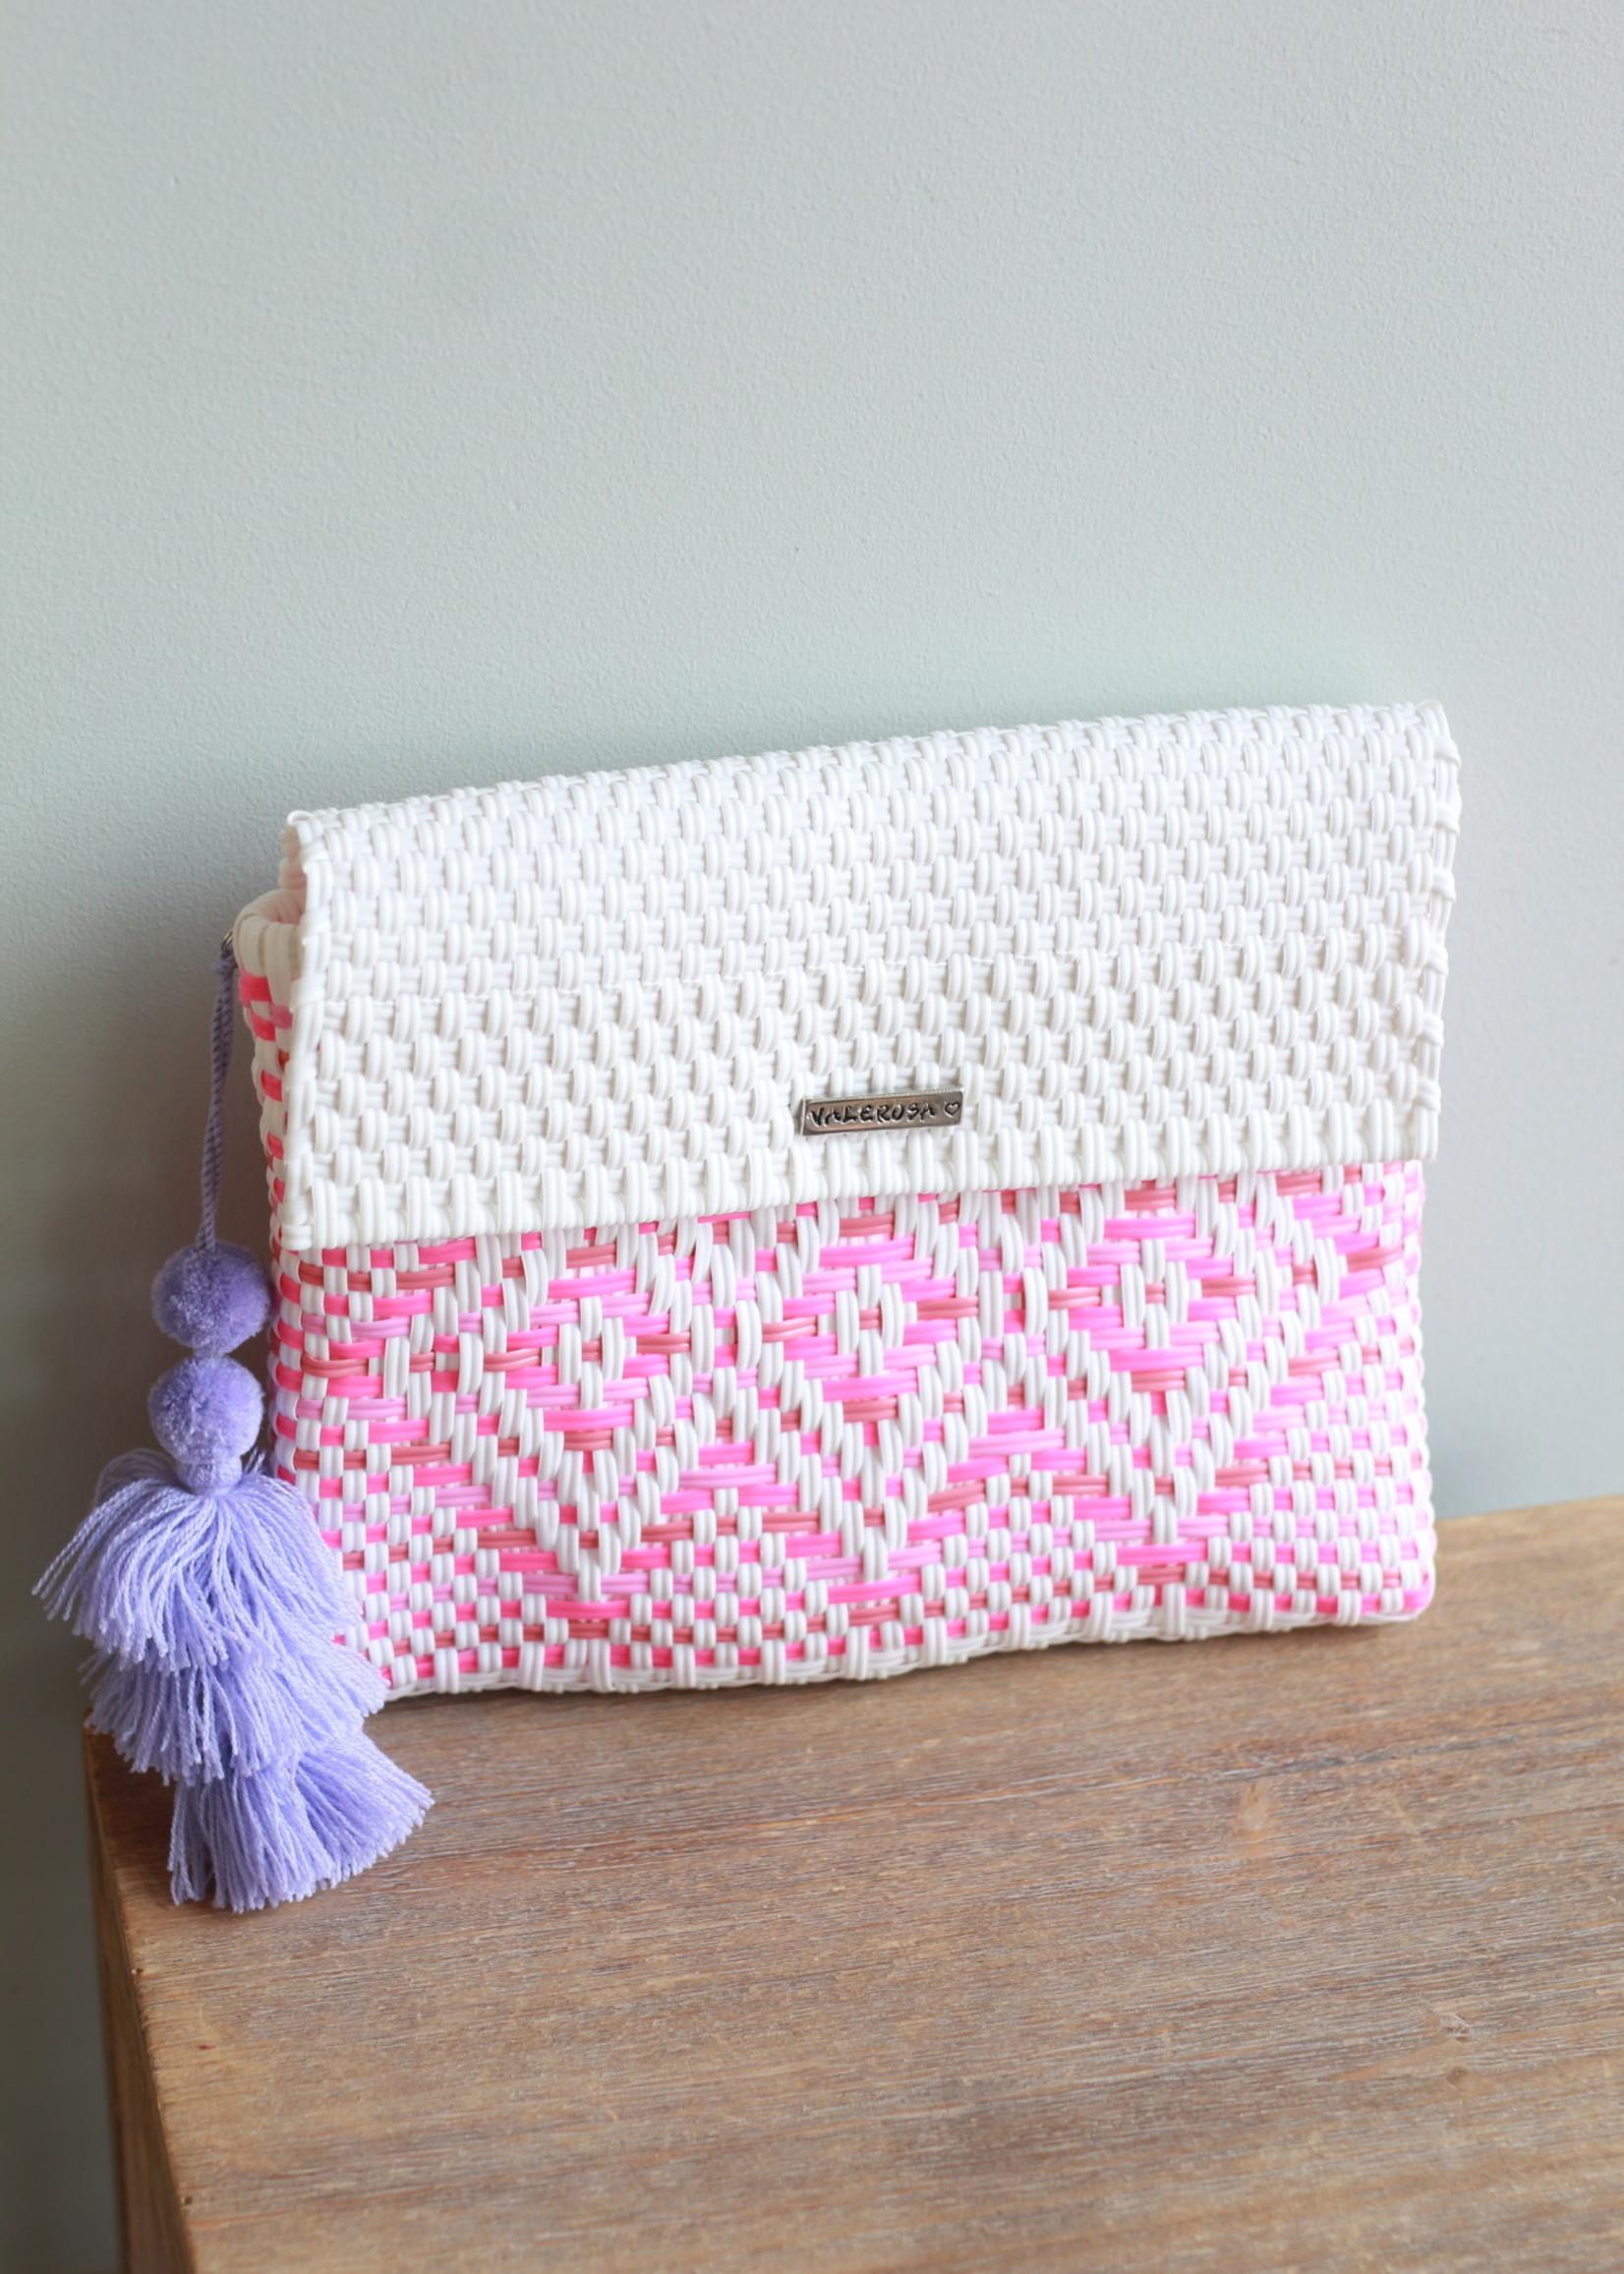 Valerosa Boutique Valerosa Pinky Clutch With Lavender Tassel